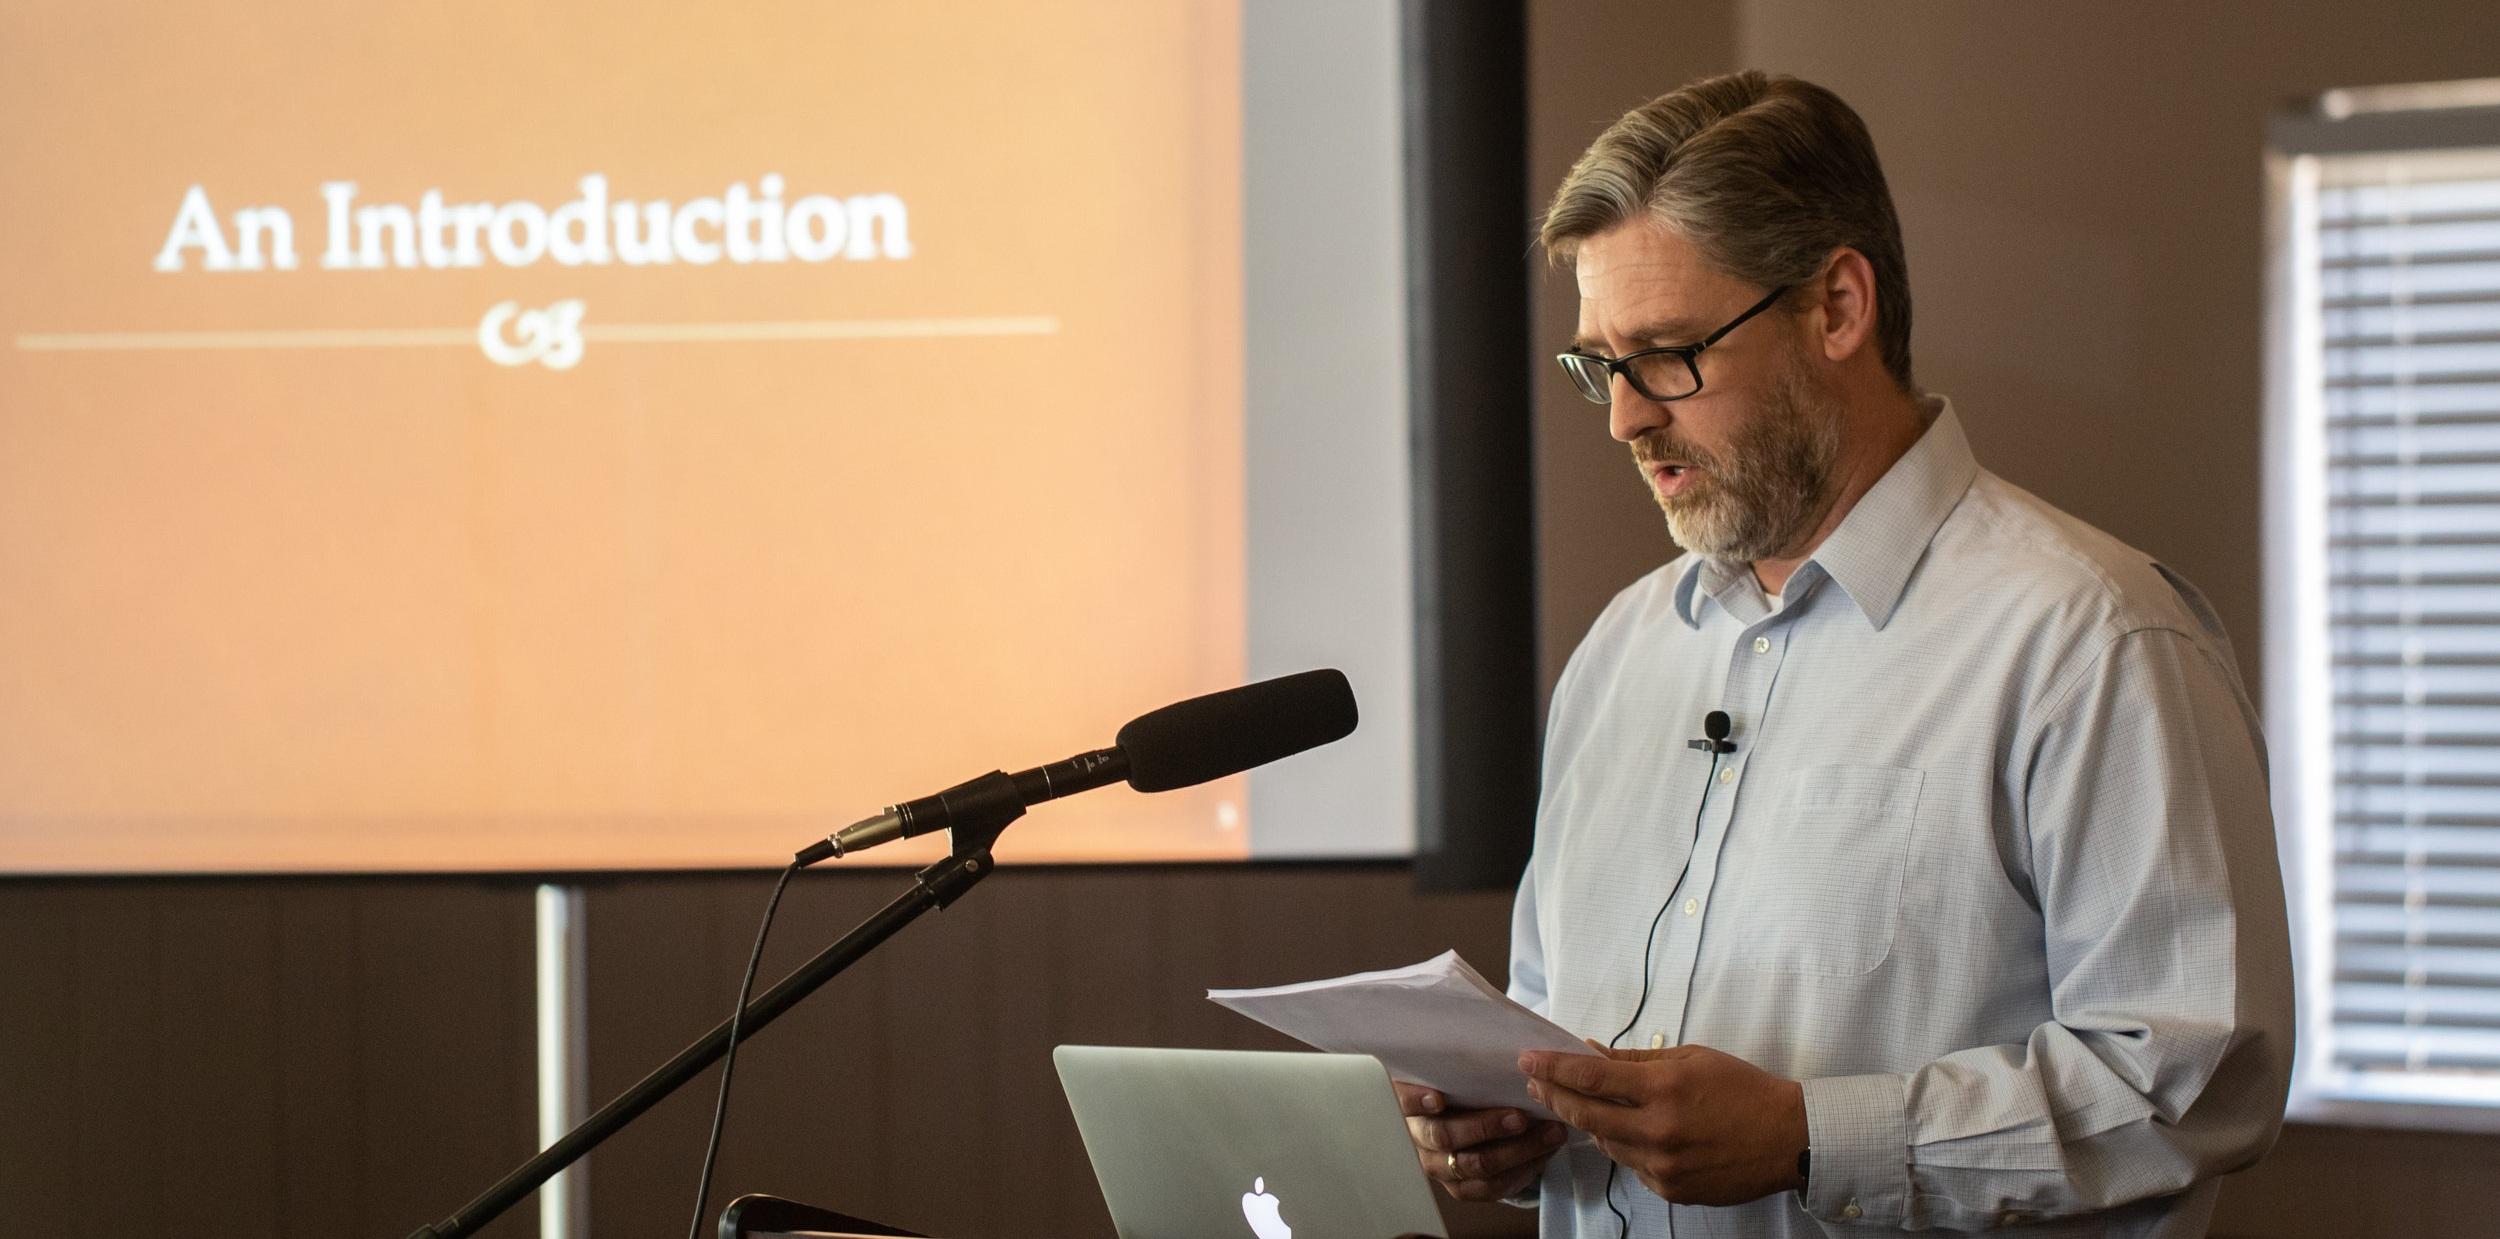 Technology Conference Presentations -